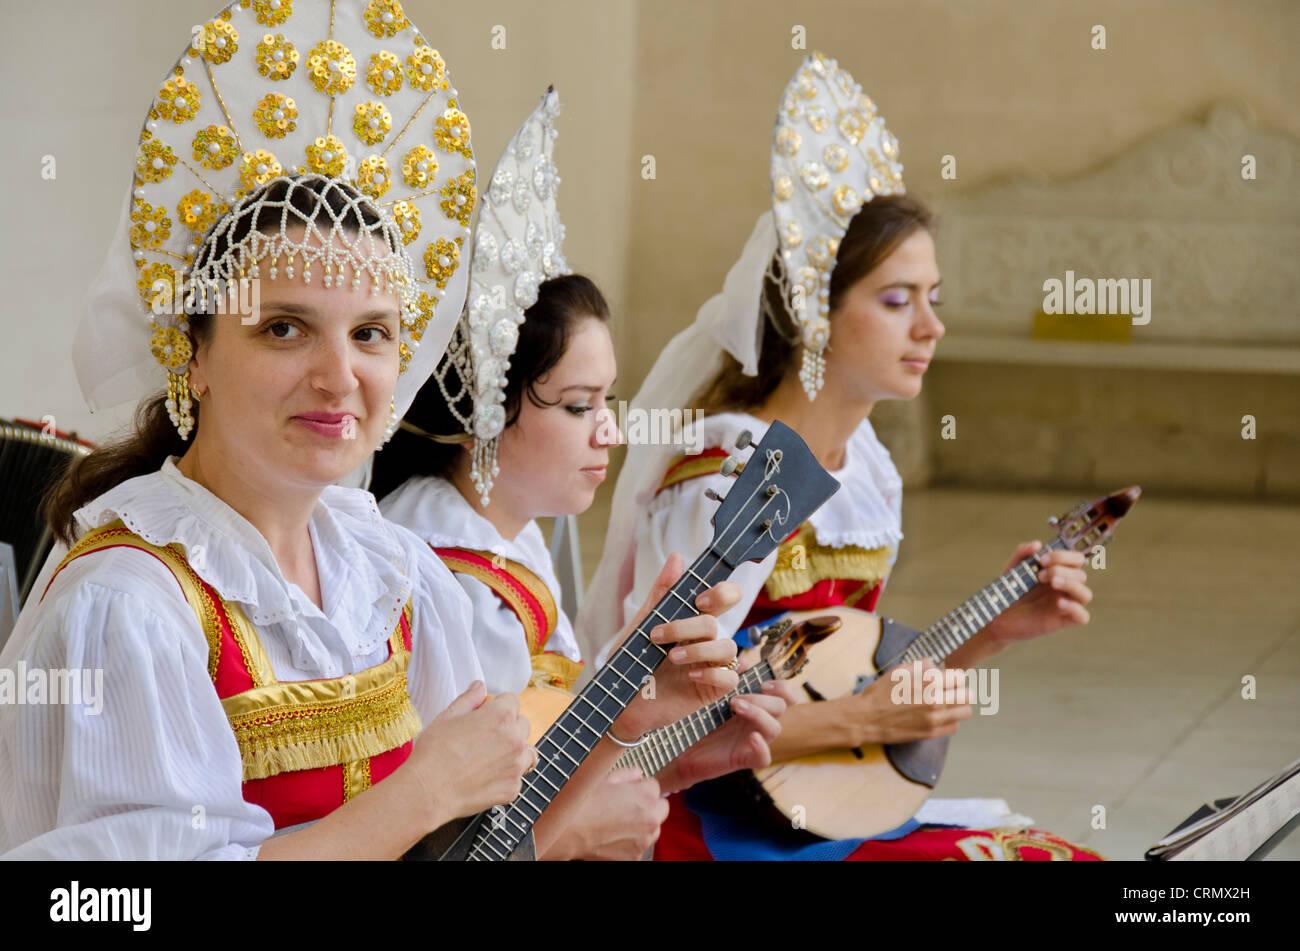 Ukraine, Yalta, Livadia Palace. Ukrainian folkloric show. Women in traditional costumes playing Russian balalaikas Stock Photo